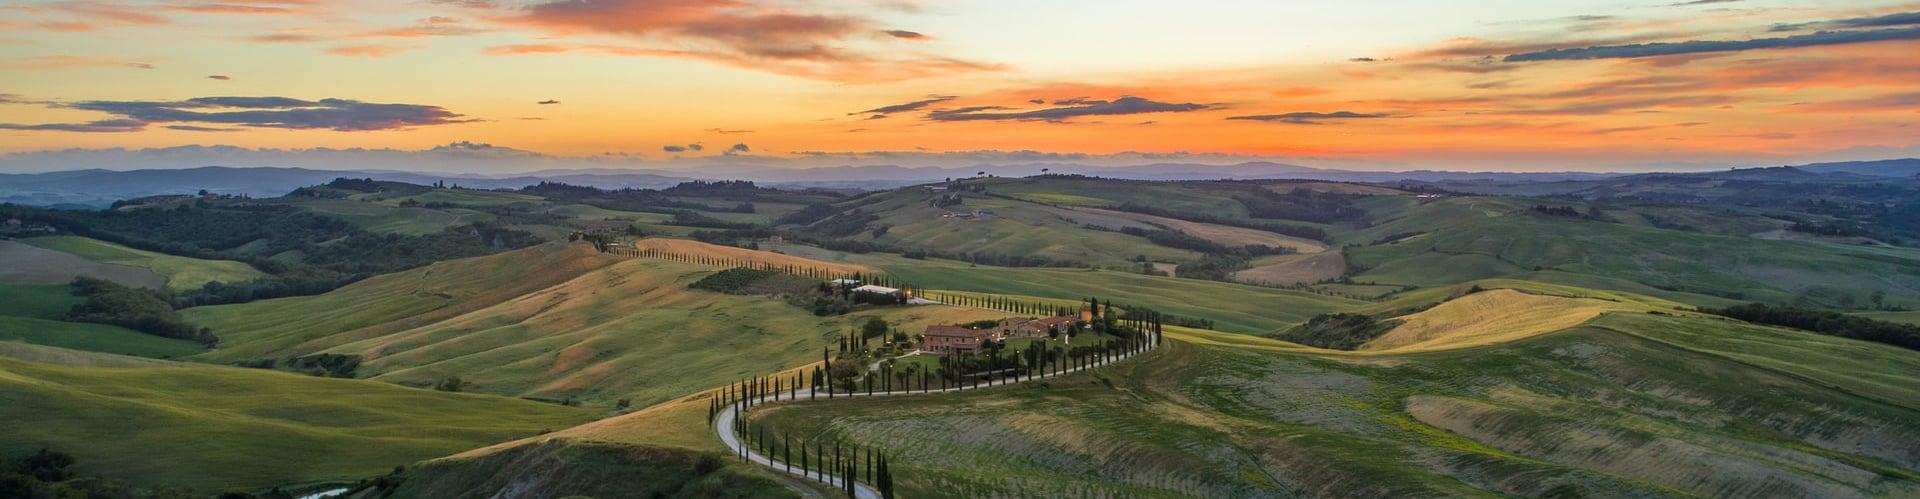 Zonsondergang in Toscane